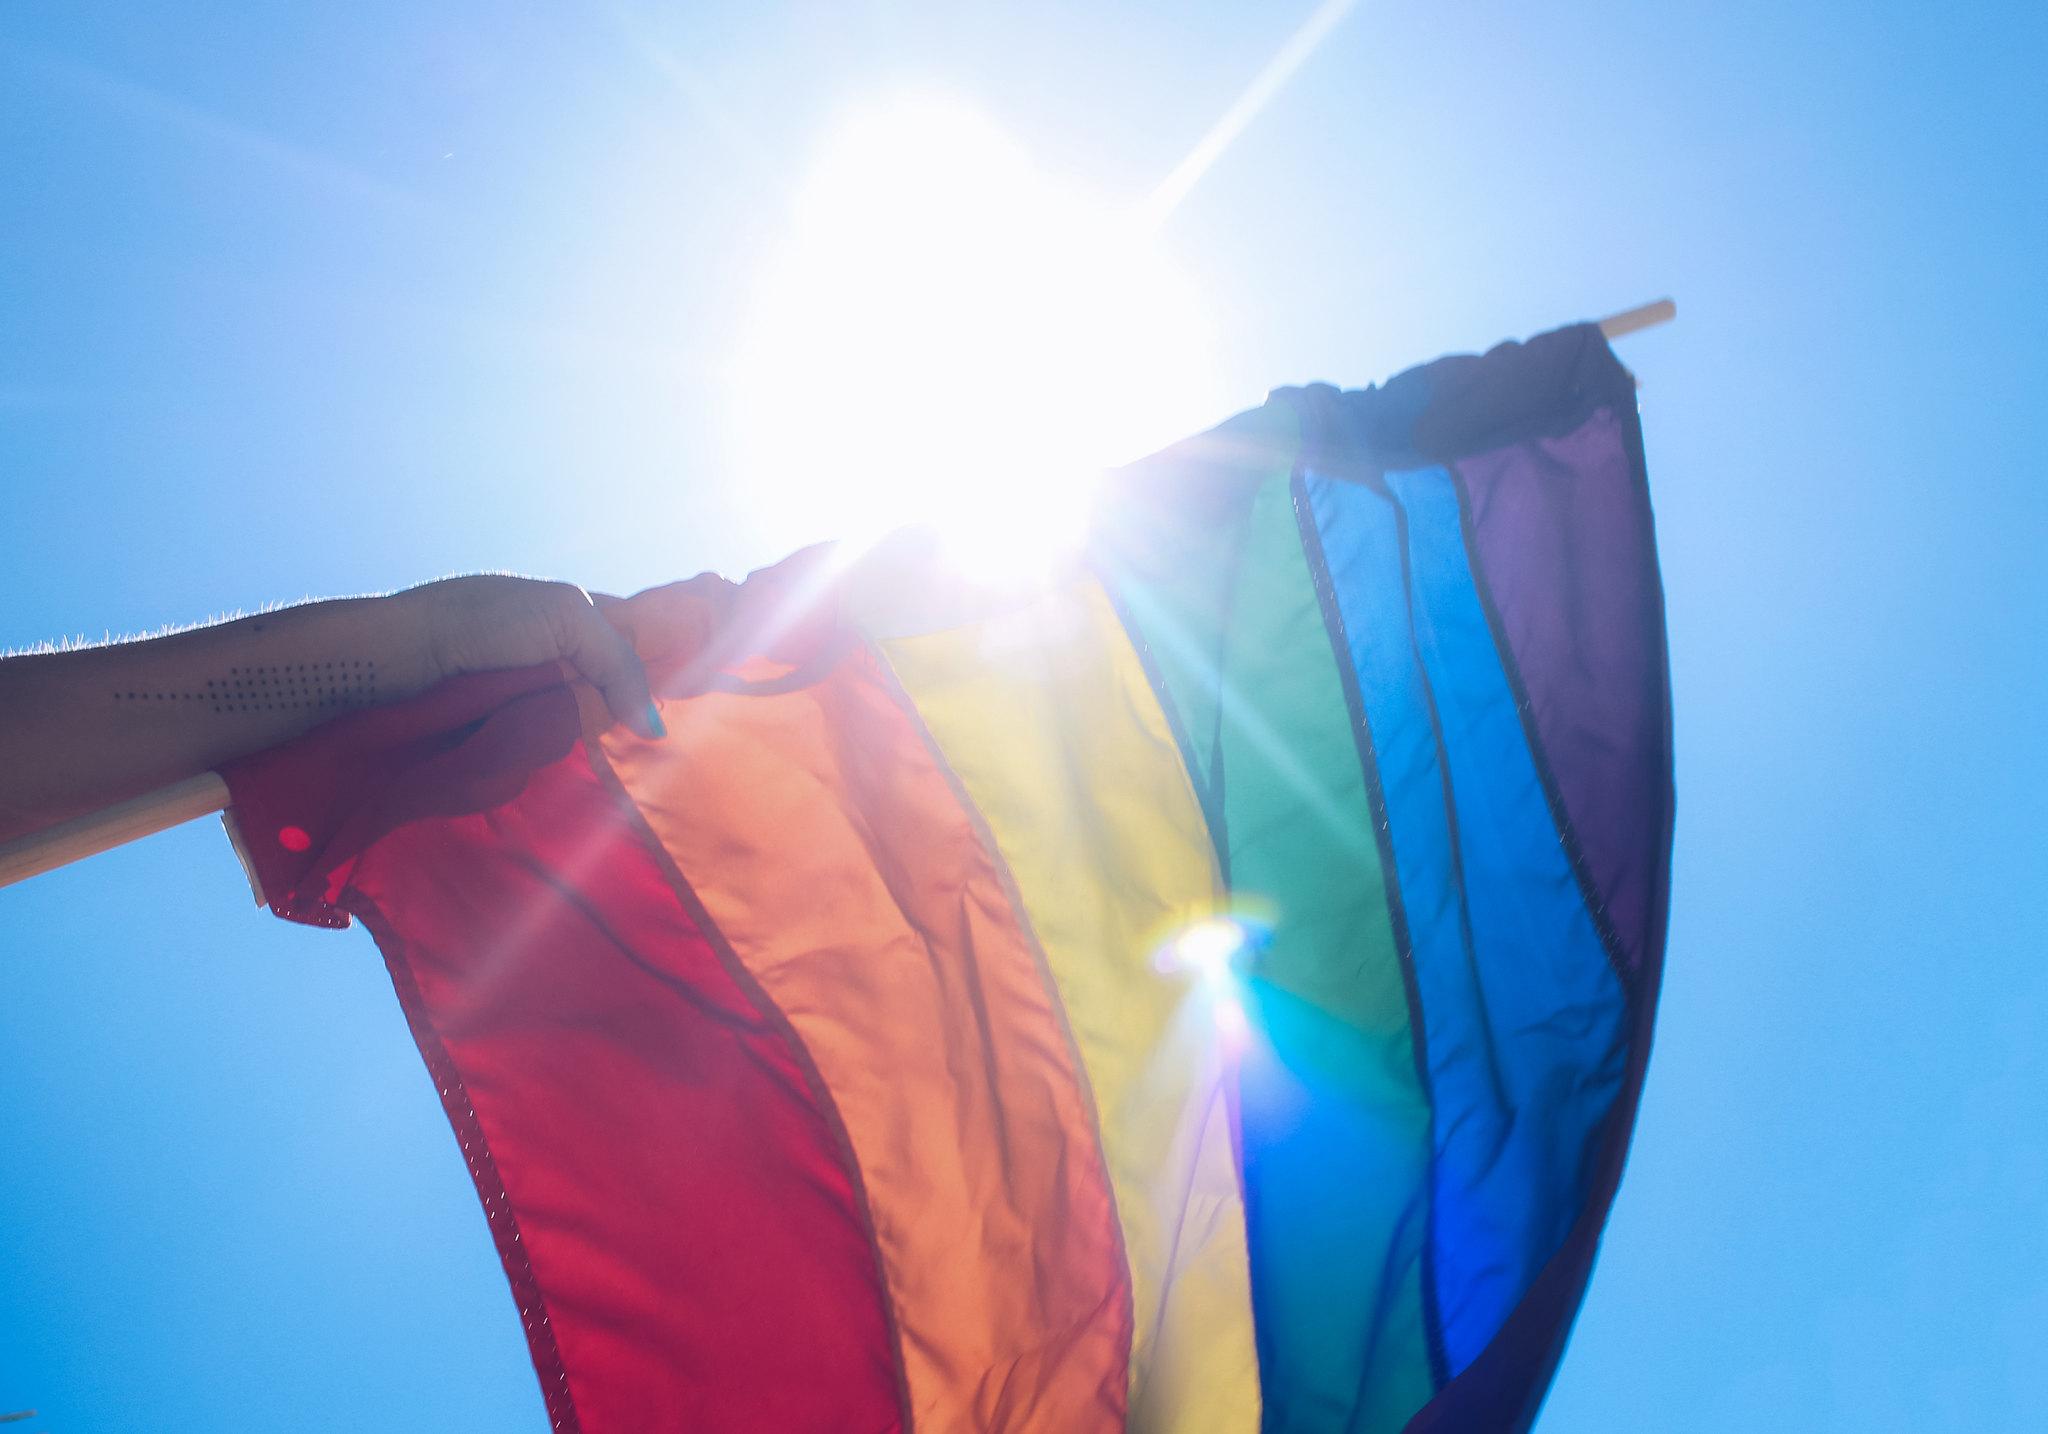 O que é ser LGBTI+?